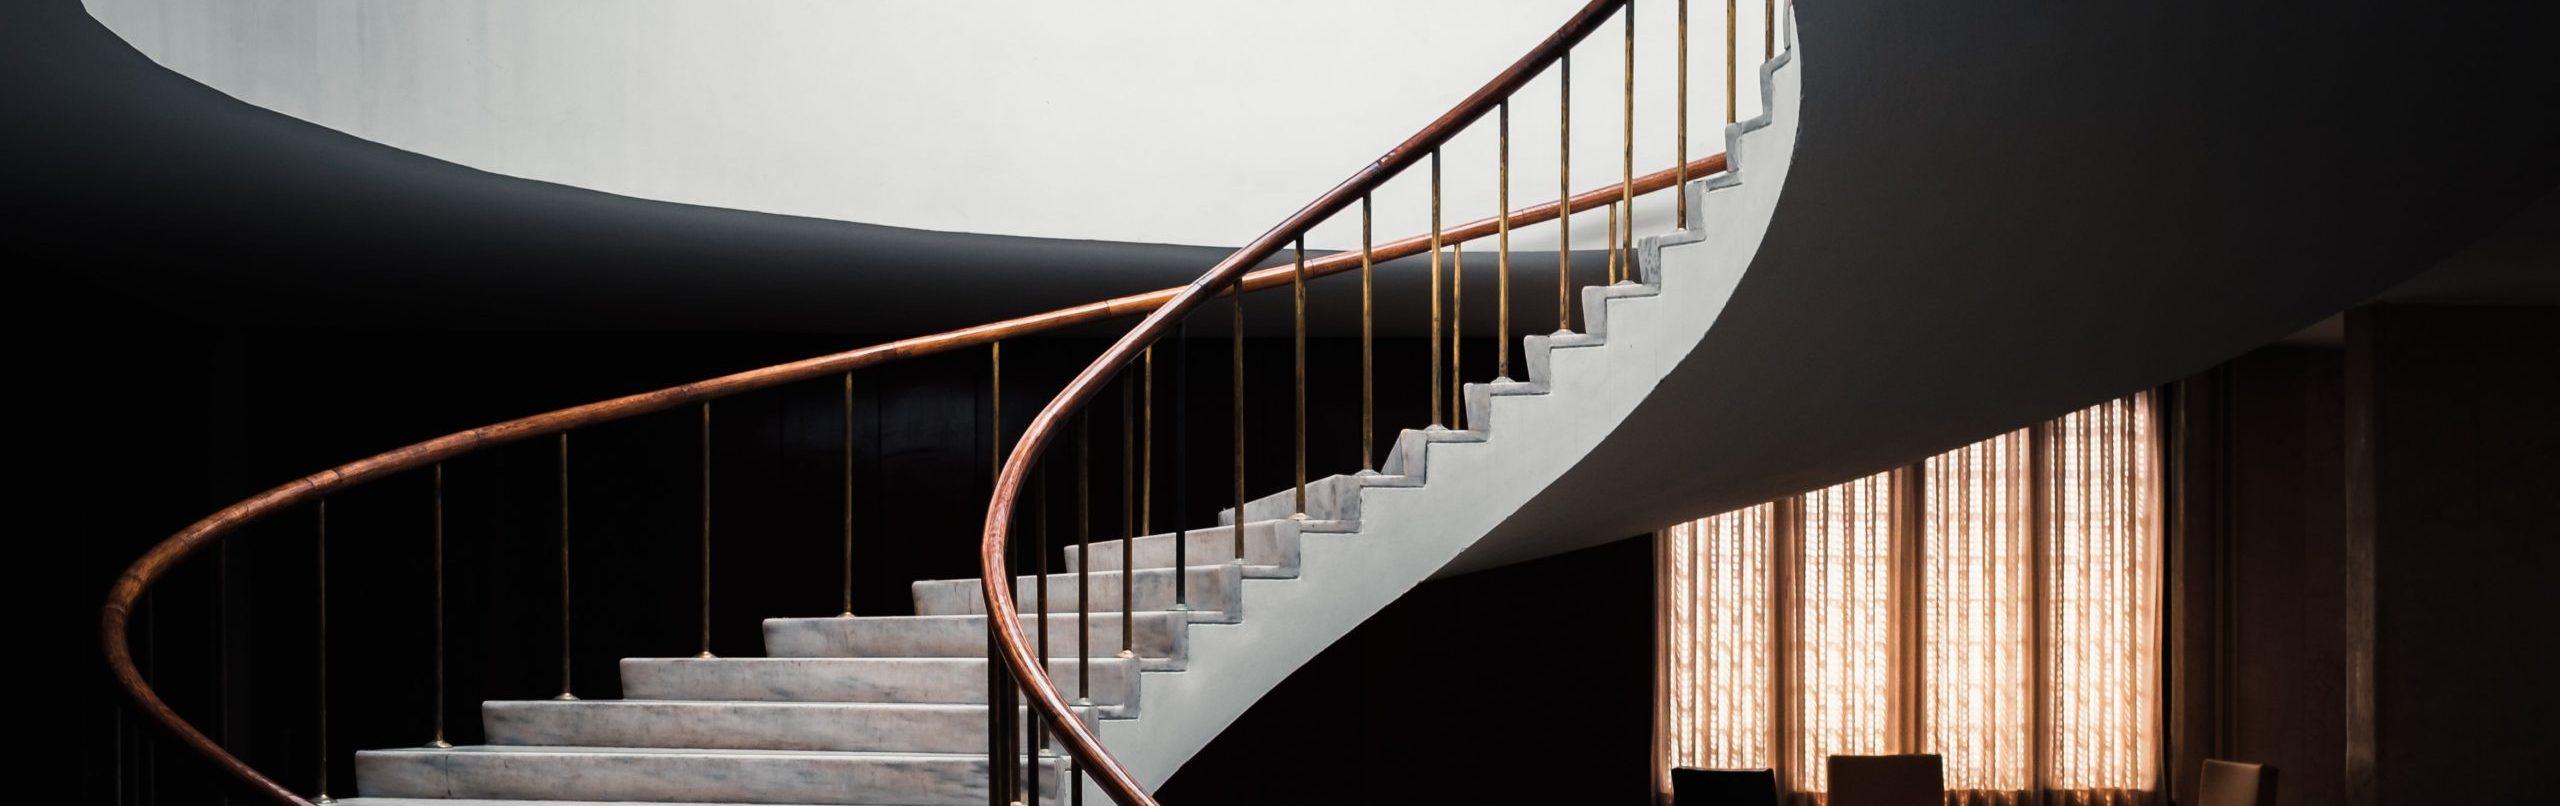 winding staircase ©Serhat Beyazkaya, unsplash.com